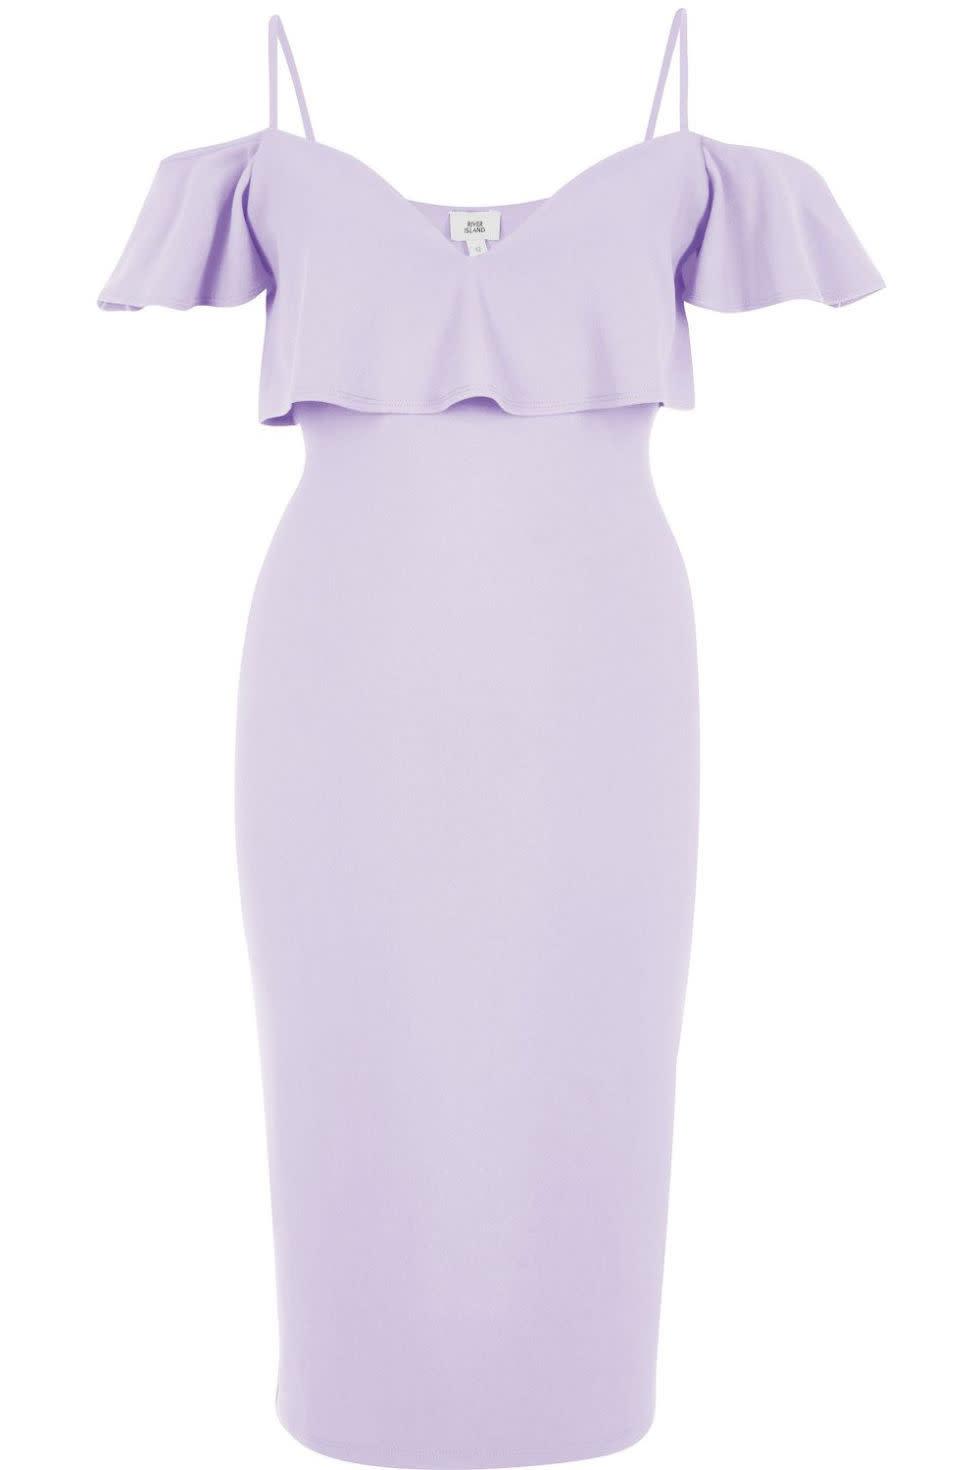 "<p><em>Light Purple Cold Shoulder Bodycon Dress, RIVER ISLAND, $70</em></p><p><a href=""https://us.riverisland.com/women/dresses/bodycon-dresses/light-purple-cold-shoulder-bodycon-dress-703327"" rel=""nofollow noopener"" target=""_blank"" data-ylk=""slk:BUY NOW"" class=""link rapid-noclick-resp"">BUY NOW</a></p>"